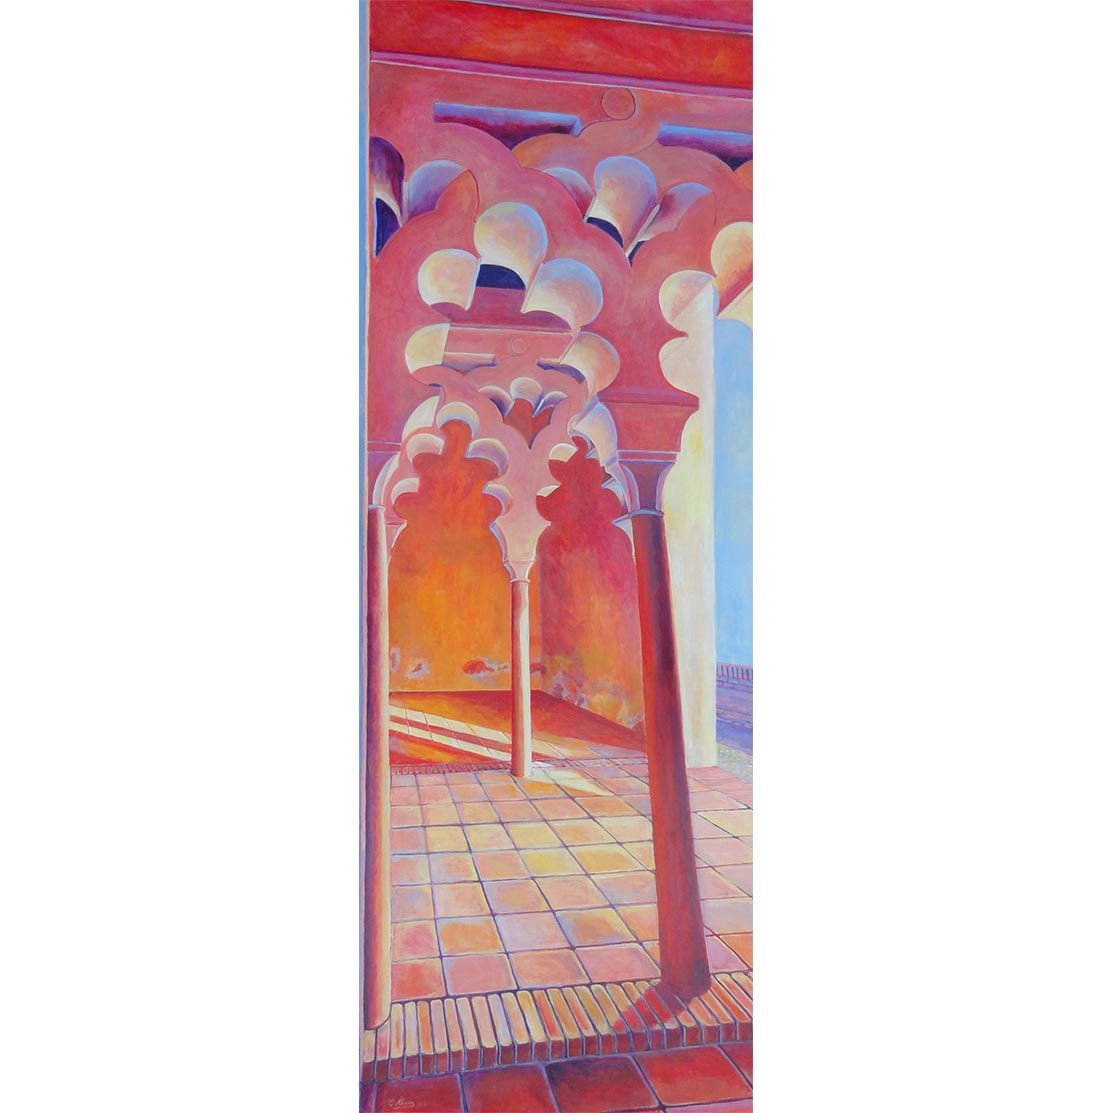 ARCOS POLILOBULADOS AL ATARDECER Acrílico sobre tabla 191 x 65 cm